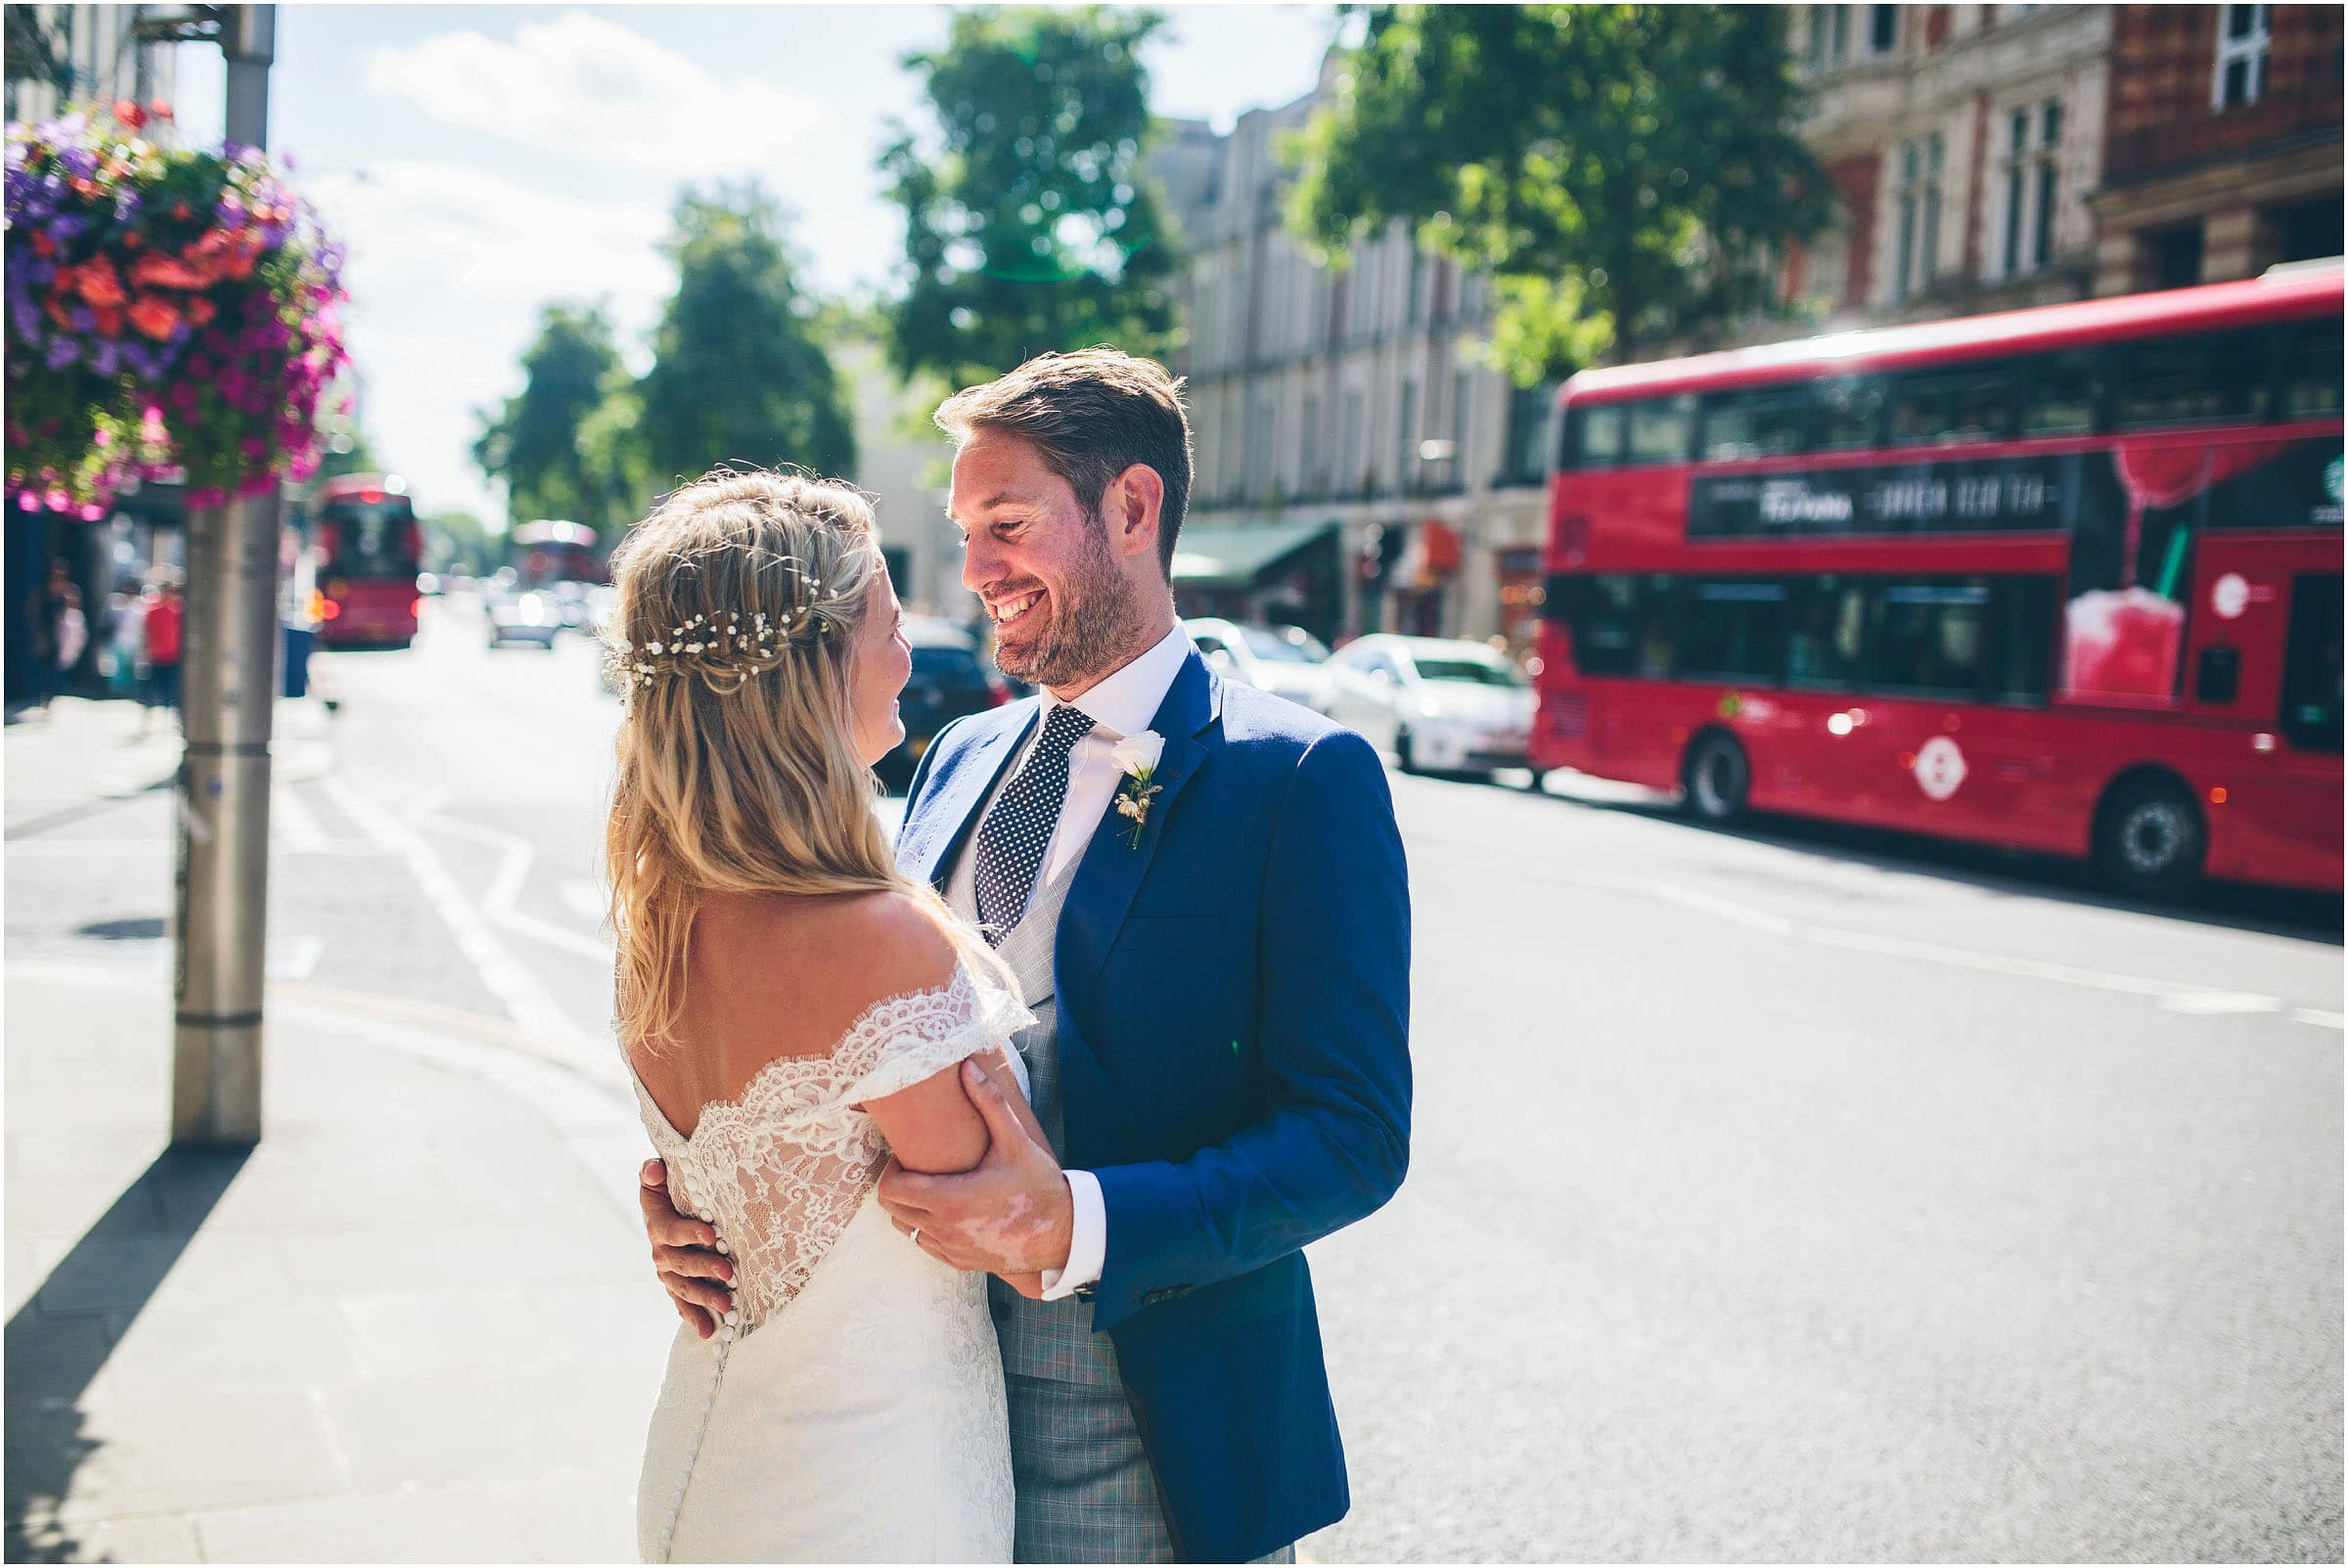 Kensington_Roof_Gardens_Wedding_Photography_0069